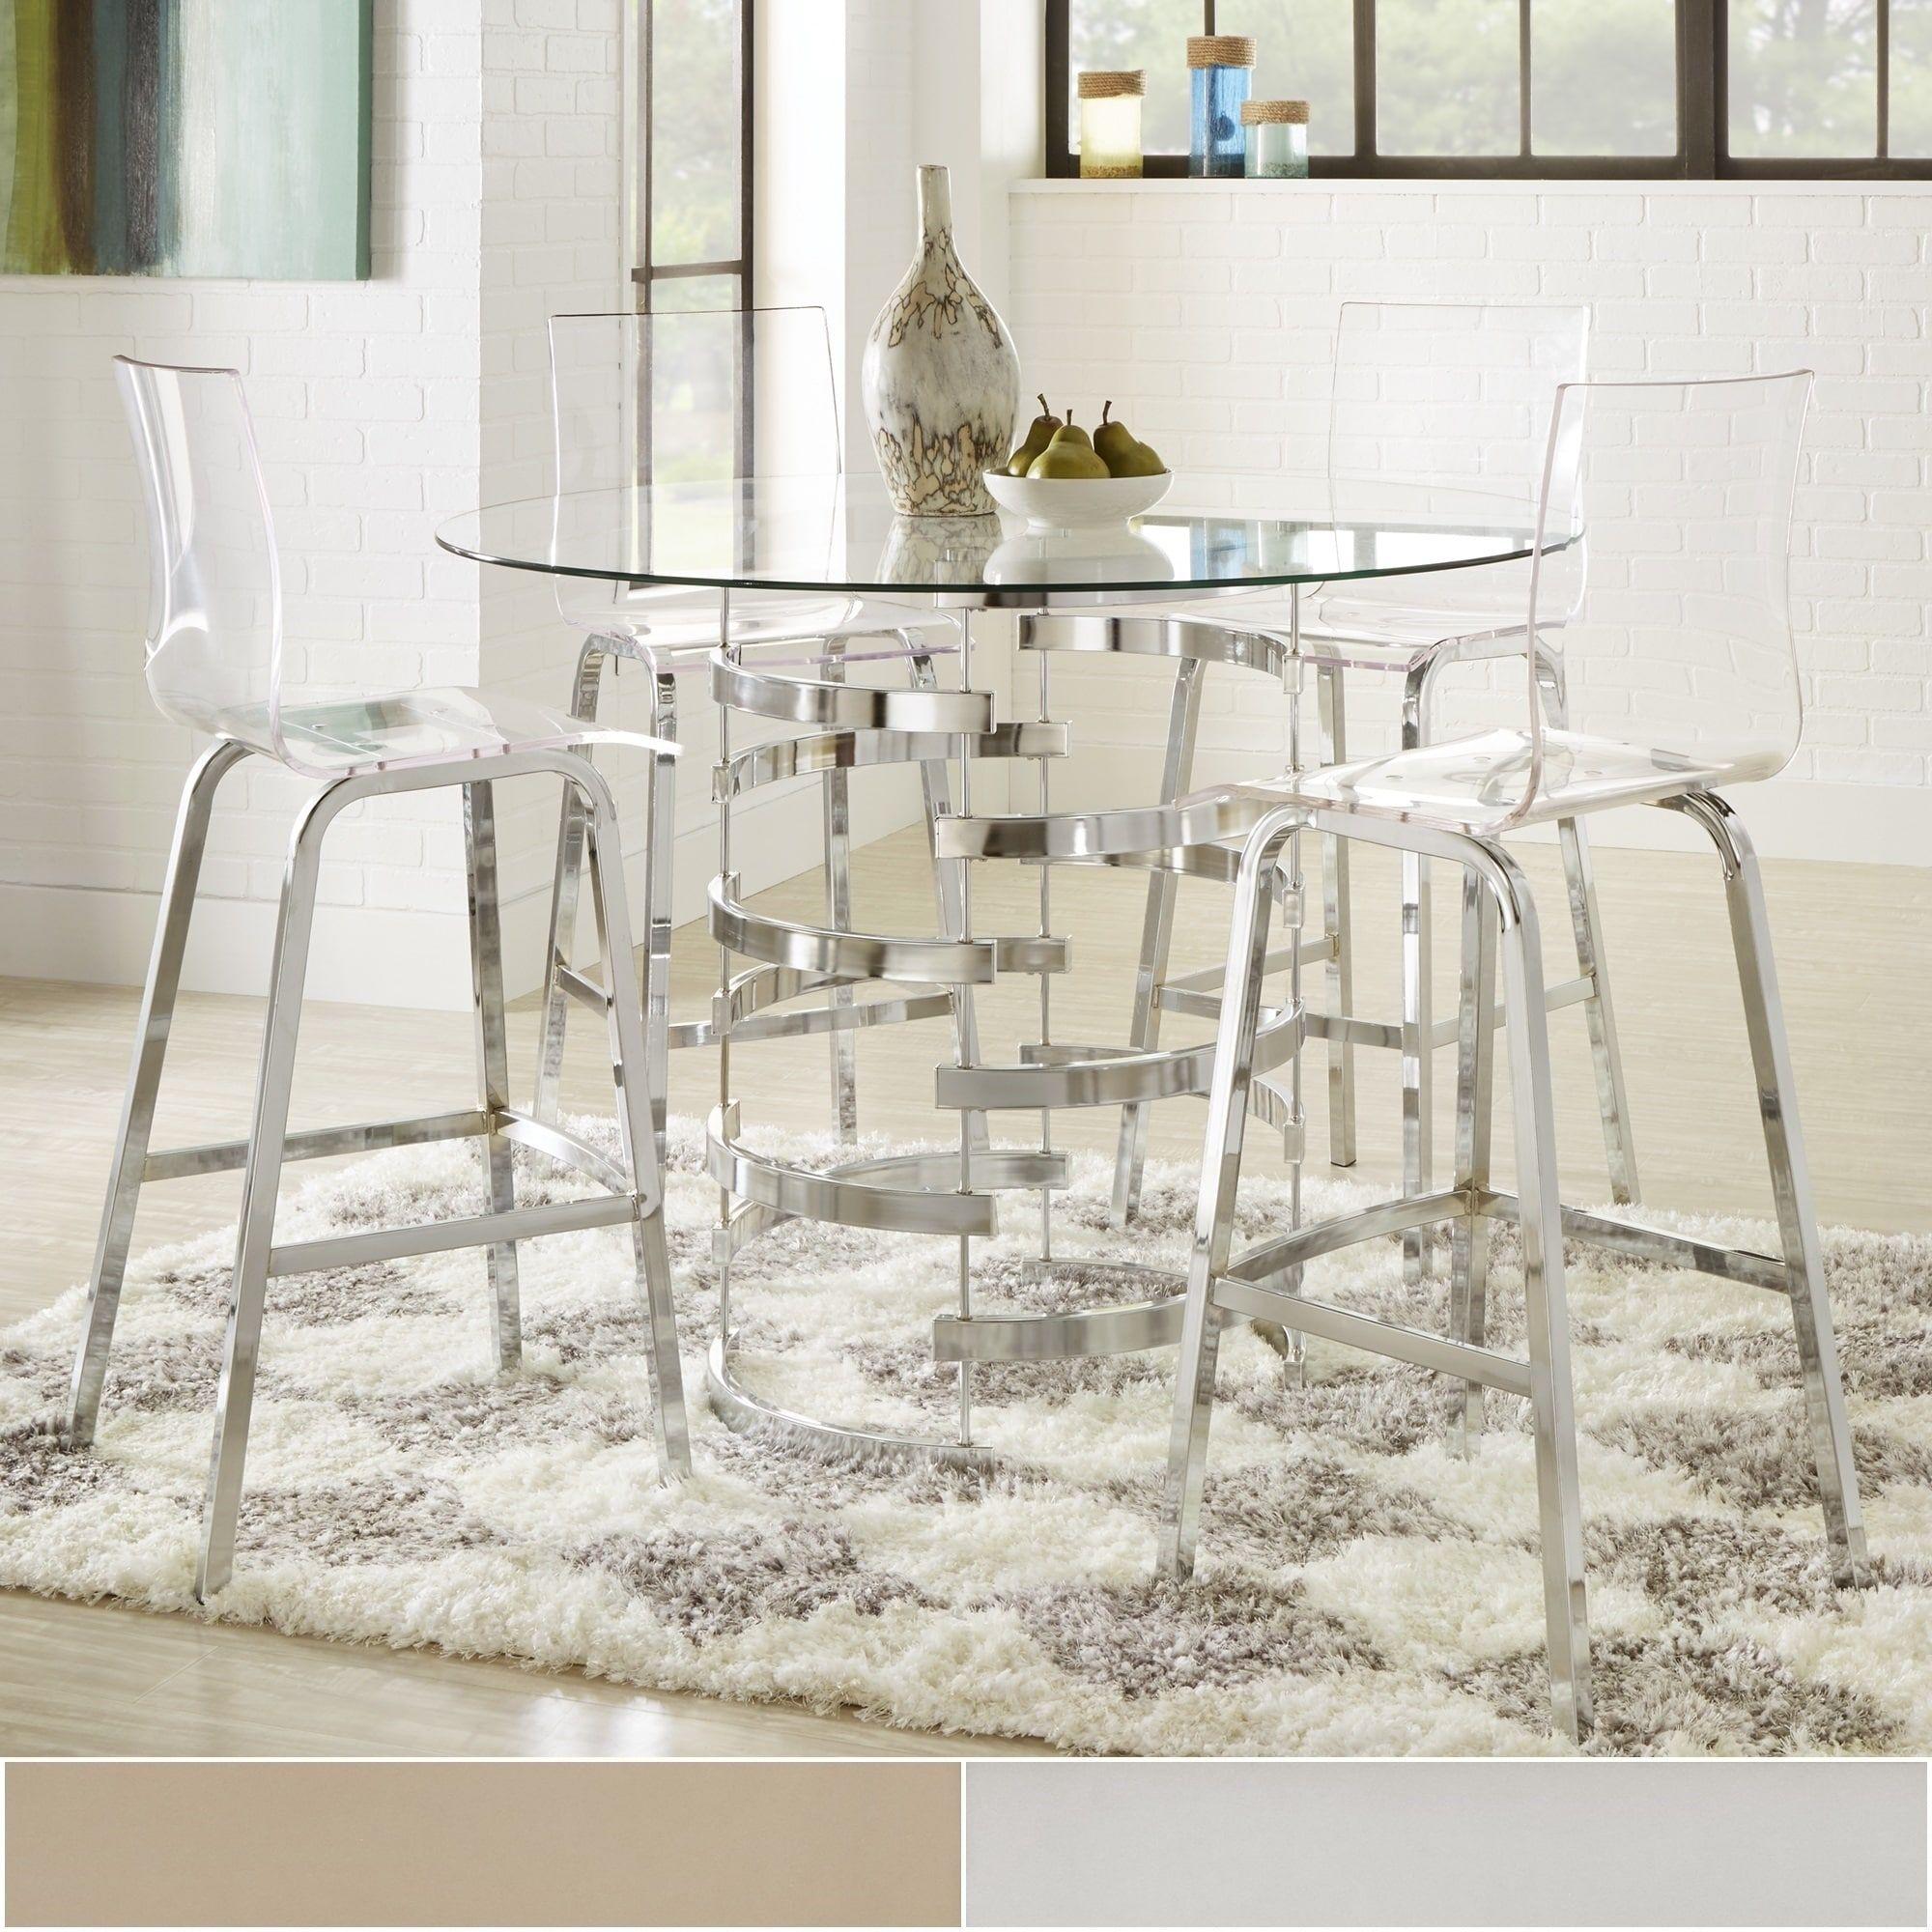 Nova Round Glass Top Vortex Iron Base 5 Piece Counter Height Dining Set By  INSPIRE